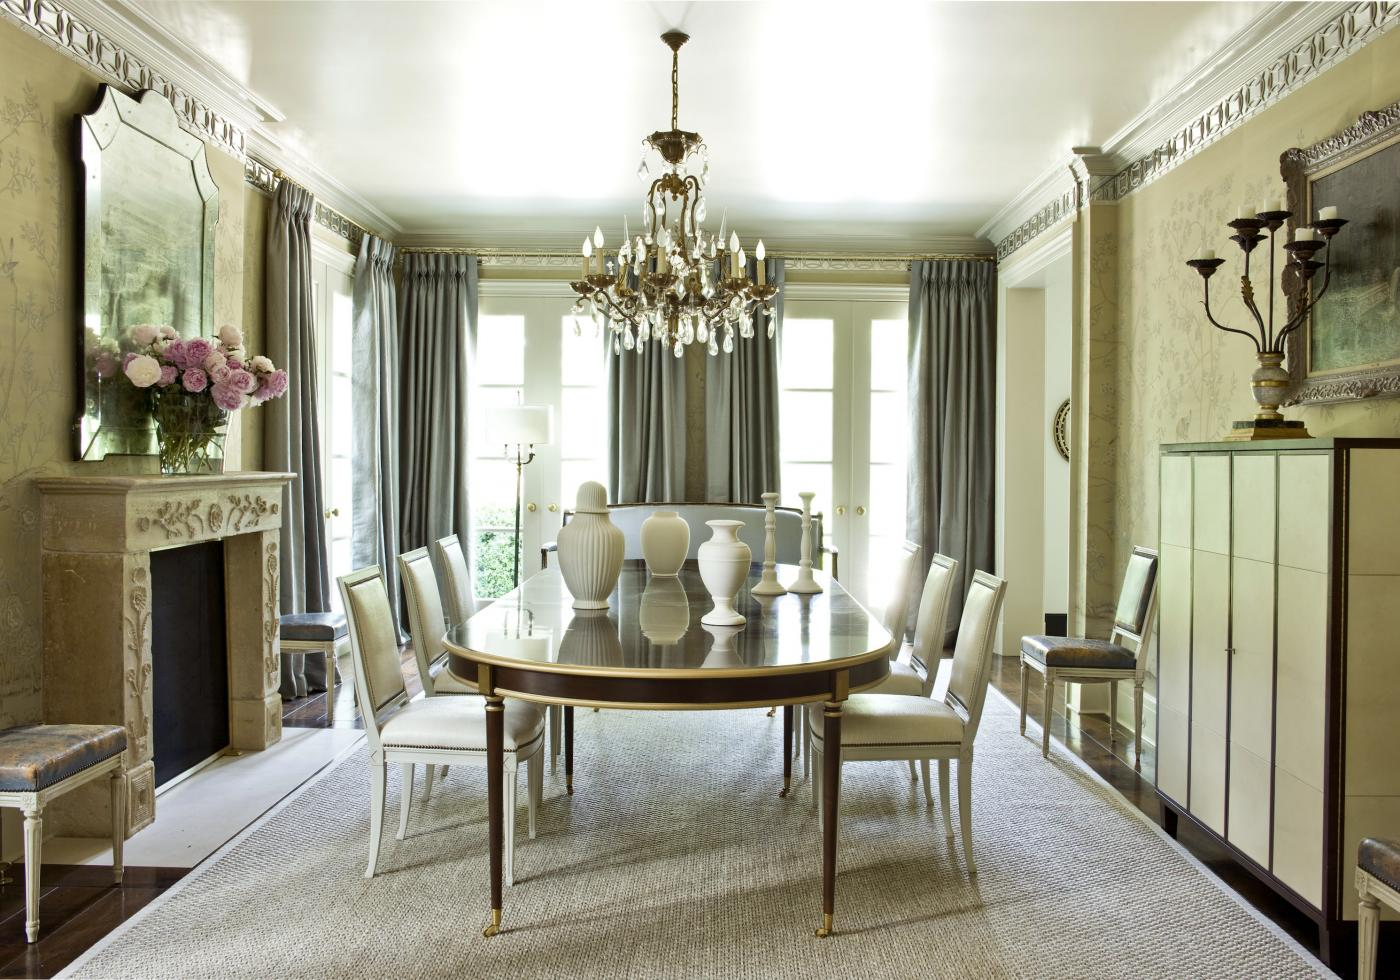 Gracious atlanta home by suzanne kasler interiors - Home interior decorators in atlanta ga ...